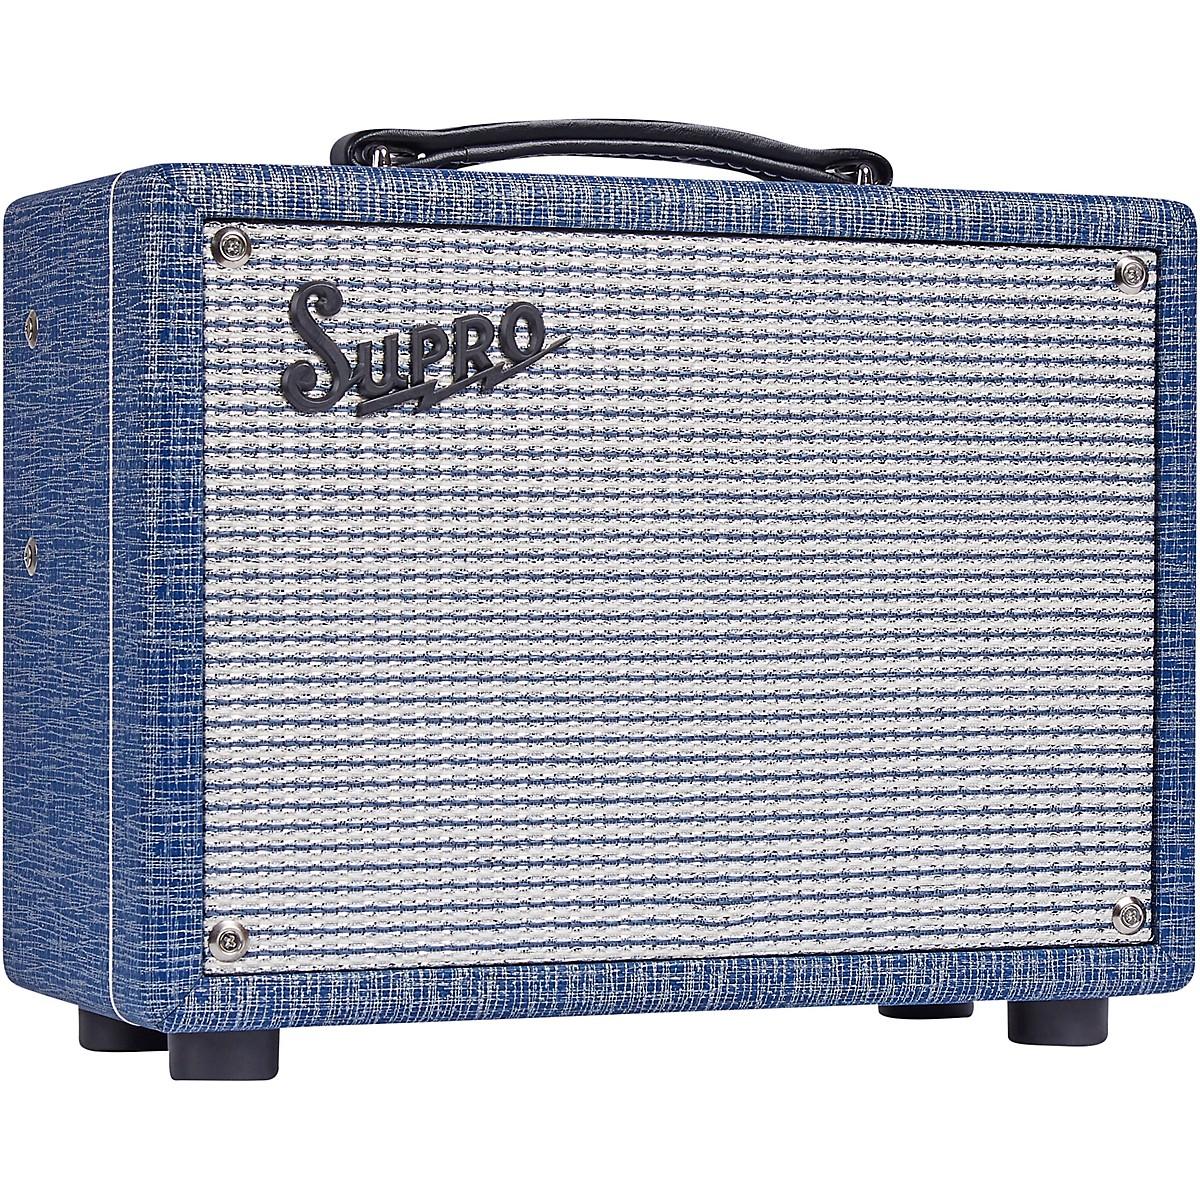 Supro 1606J 64 Super 5W 1x8 Tube Guitar Combo Amp